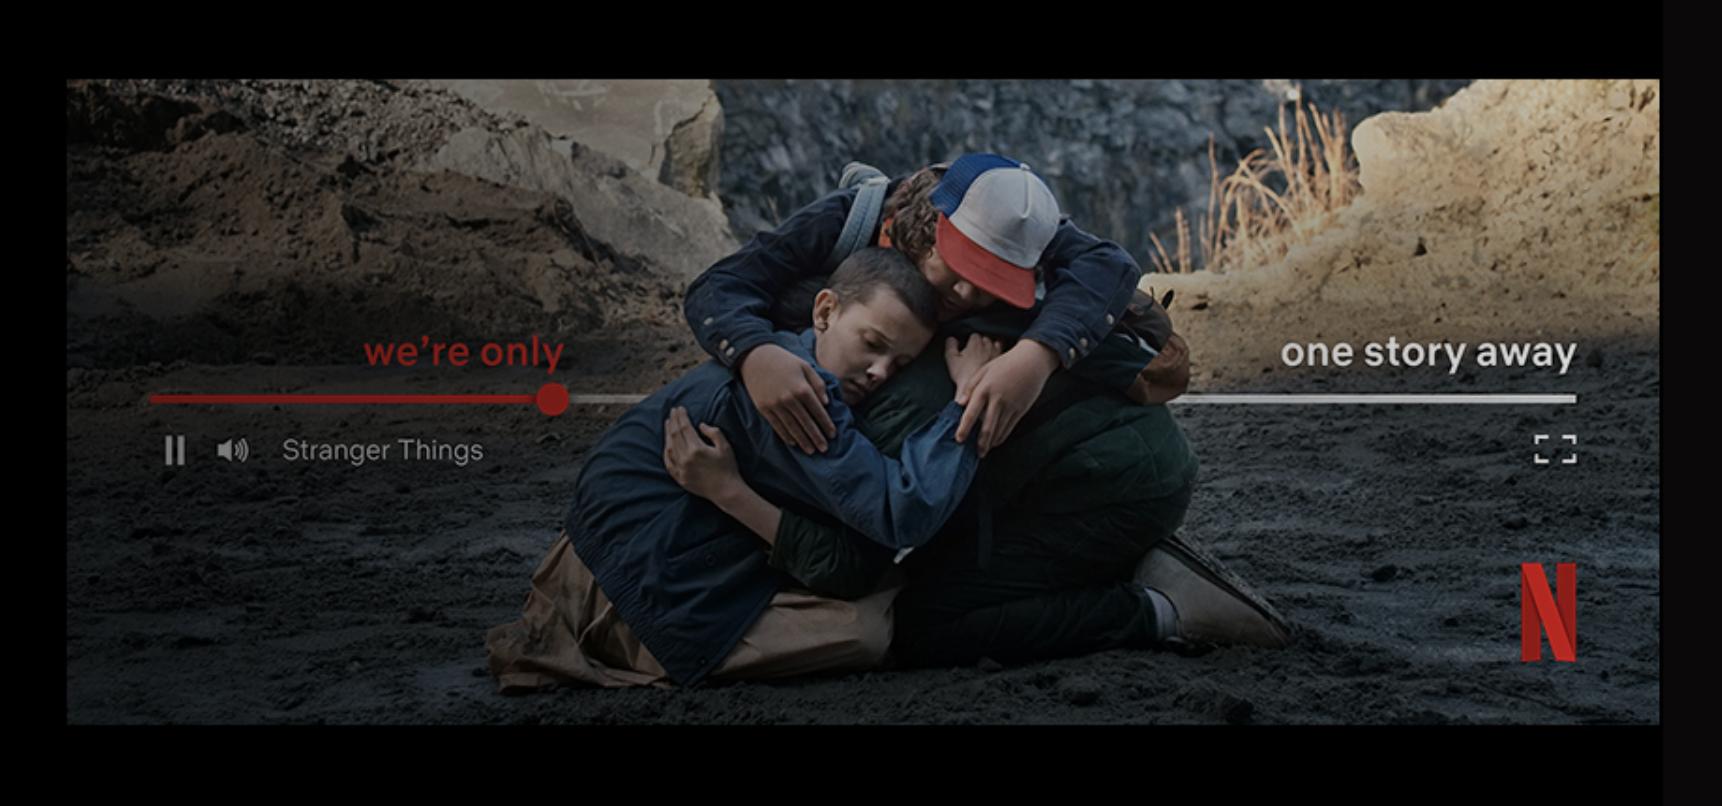 how to write a tagline: screenshot of the Netflix tagline One Story Away